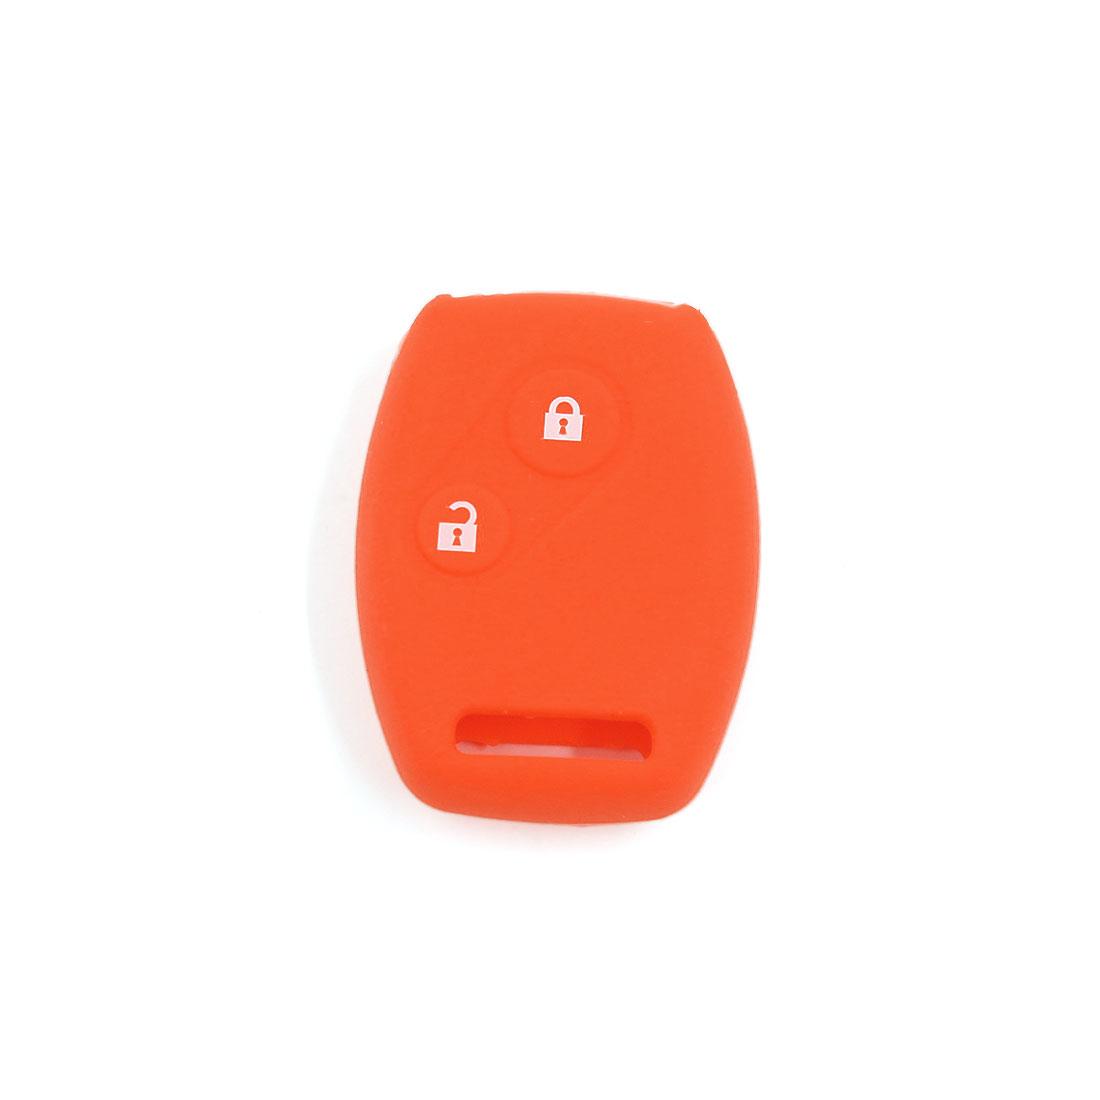 Orange Key Cover Car Silicone Skin Fob Shell for Honda Civic Accord CR-V 2BT